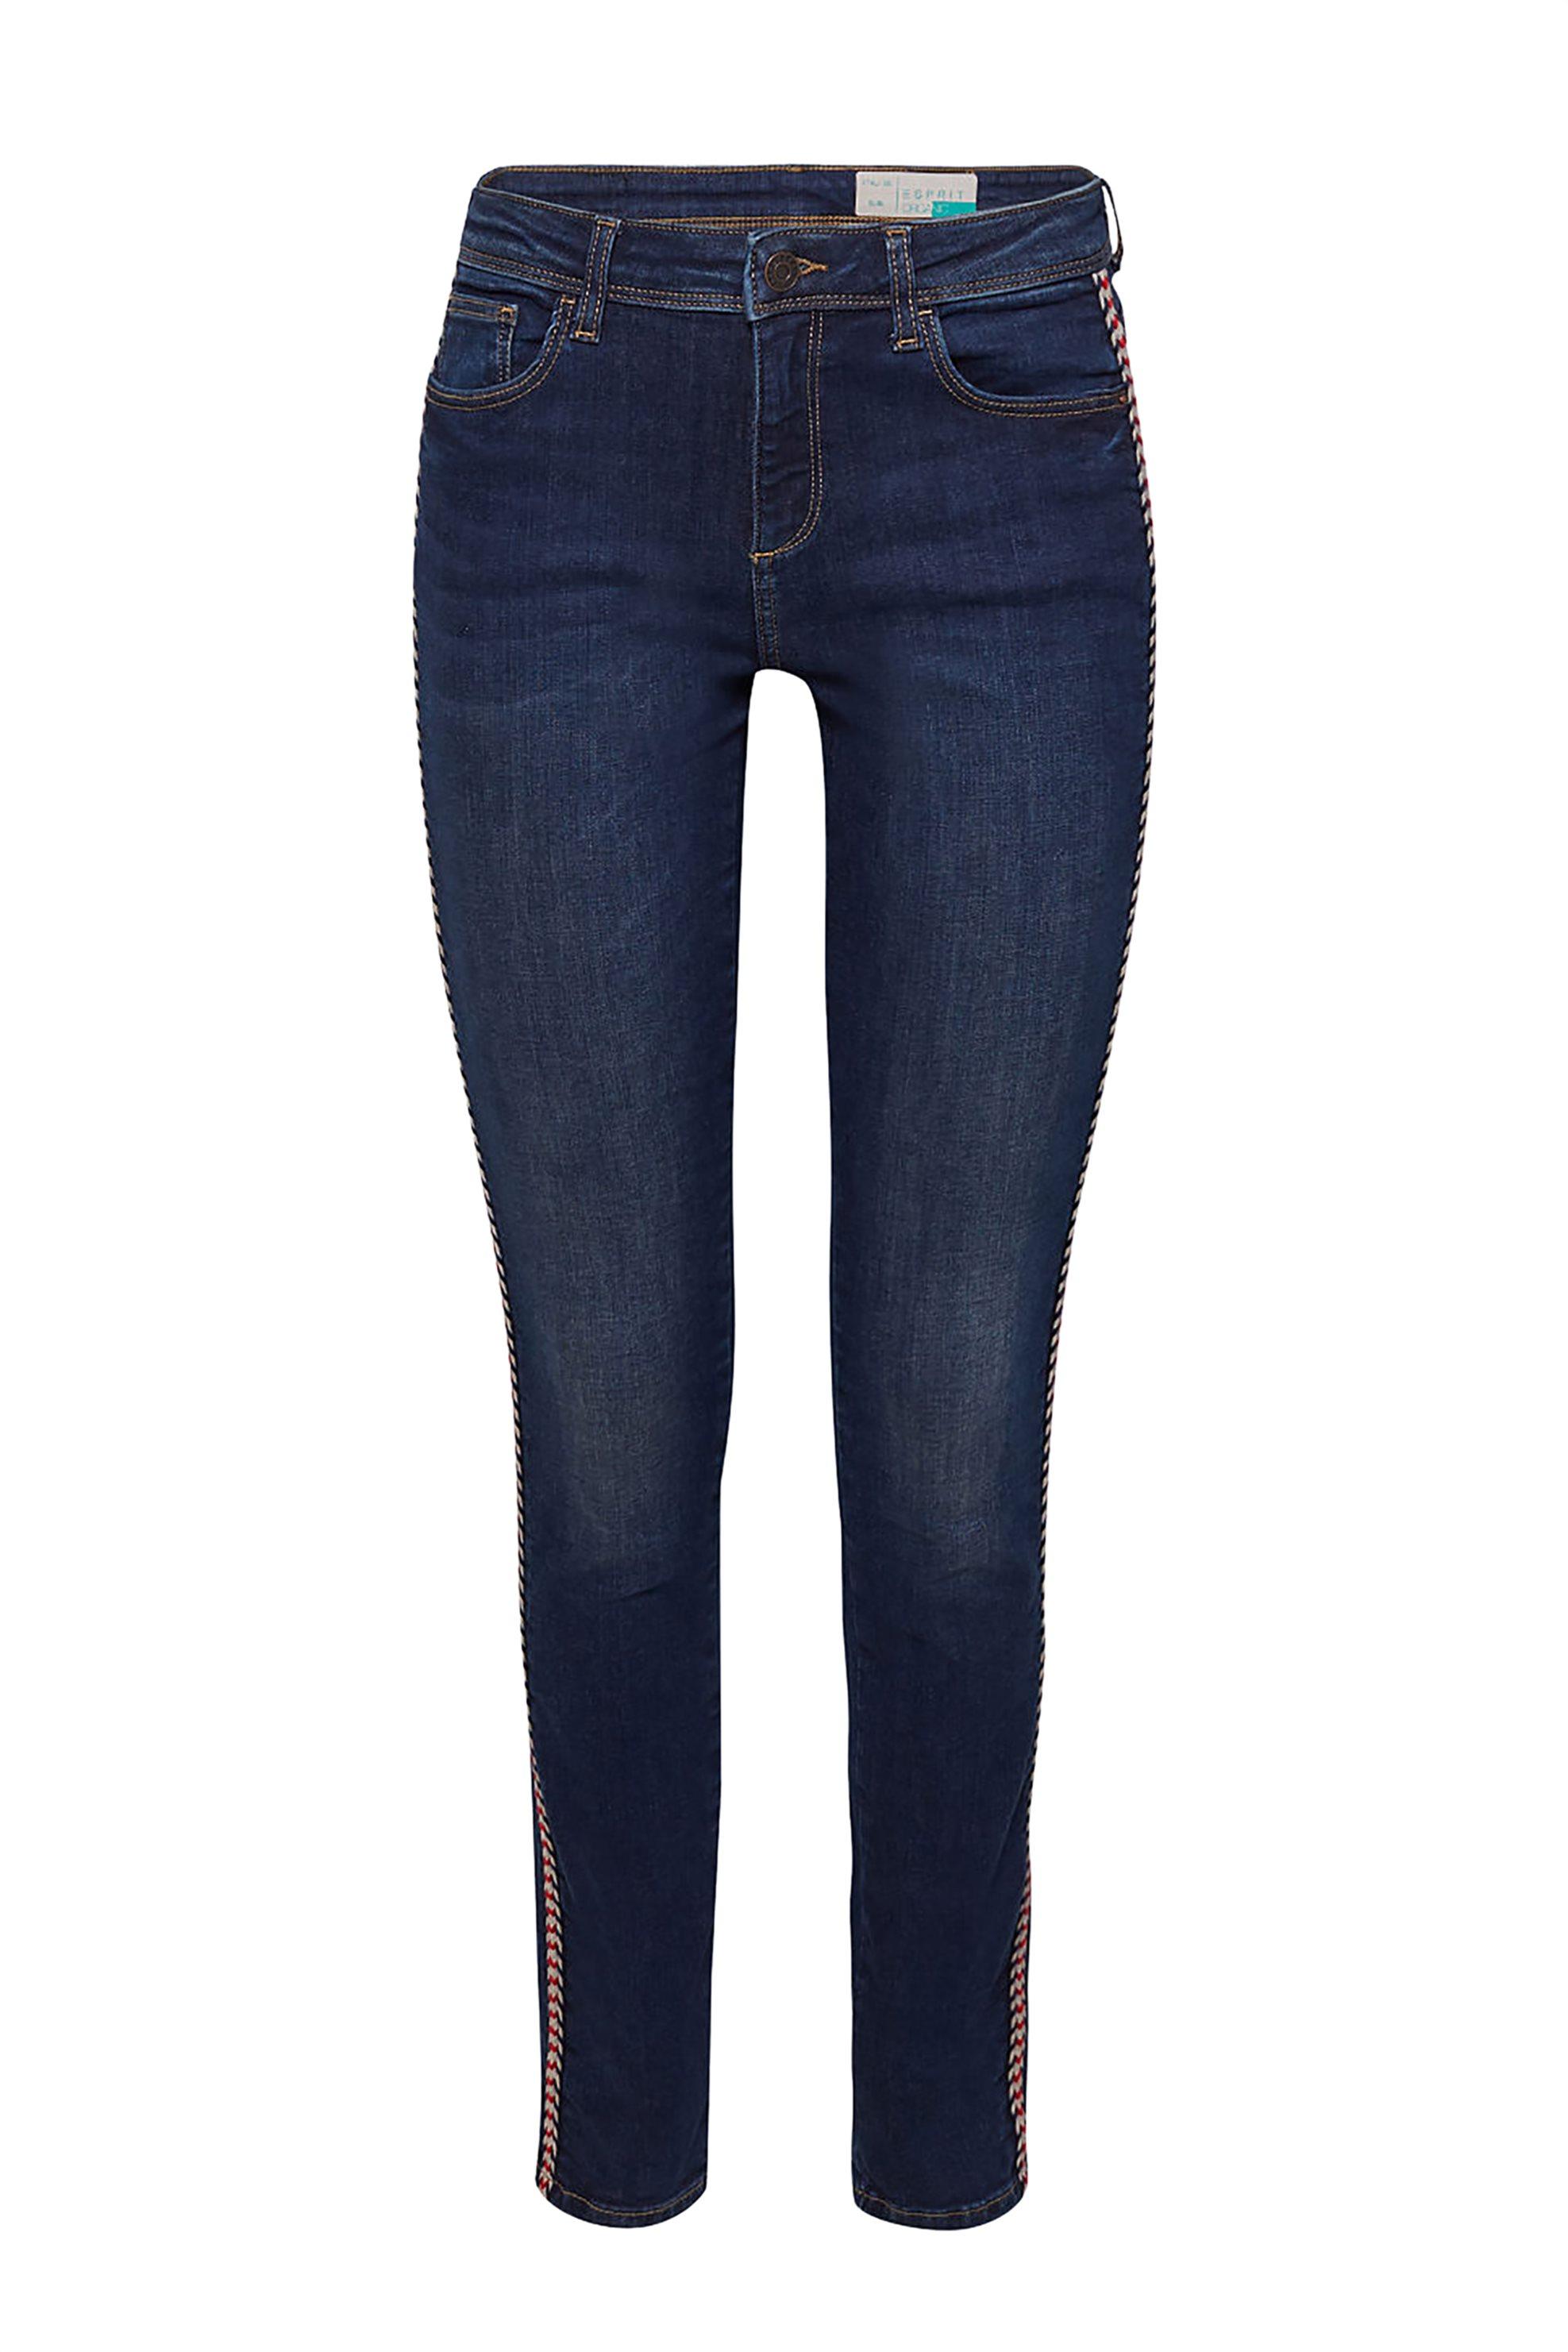 Esprit γυναικείο τζην παντελόνι με κορδόνι στο πλάι (32L) - 029EE1B023 - Μπλε Σκ γυναικα   ρουχα   jeans   skinny   slim